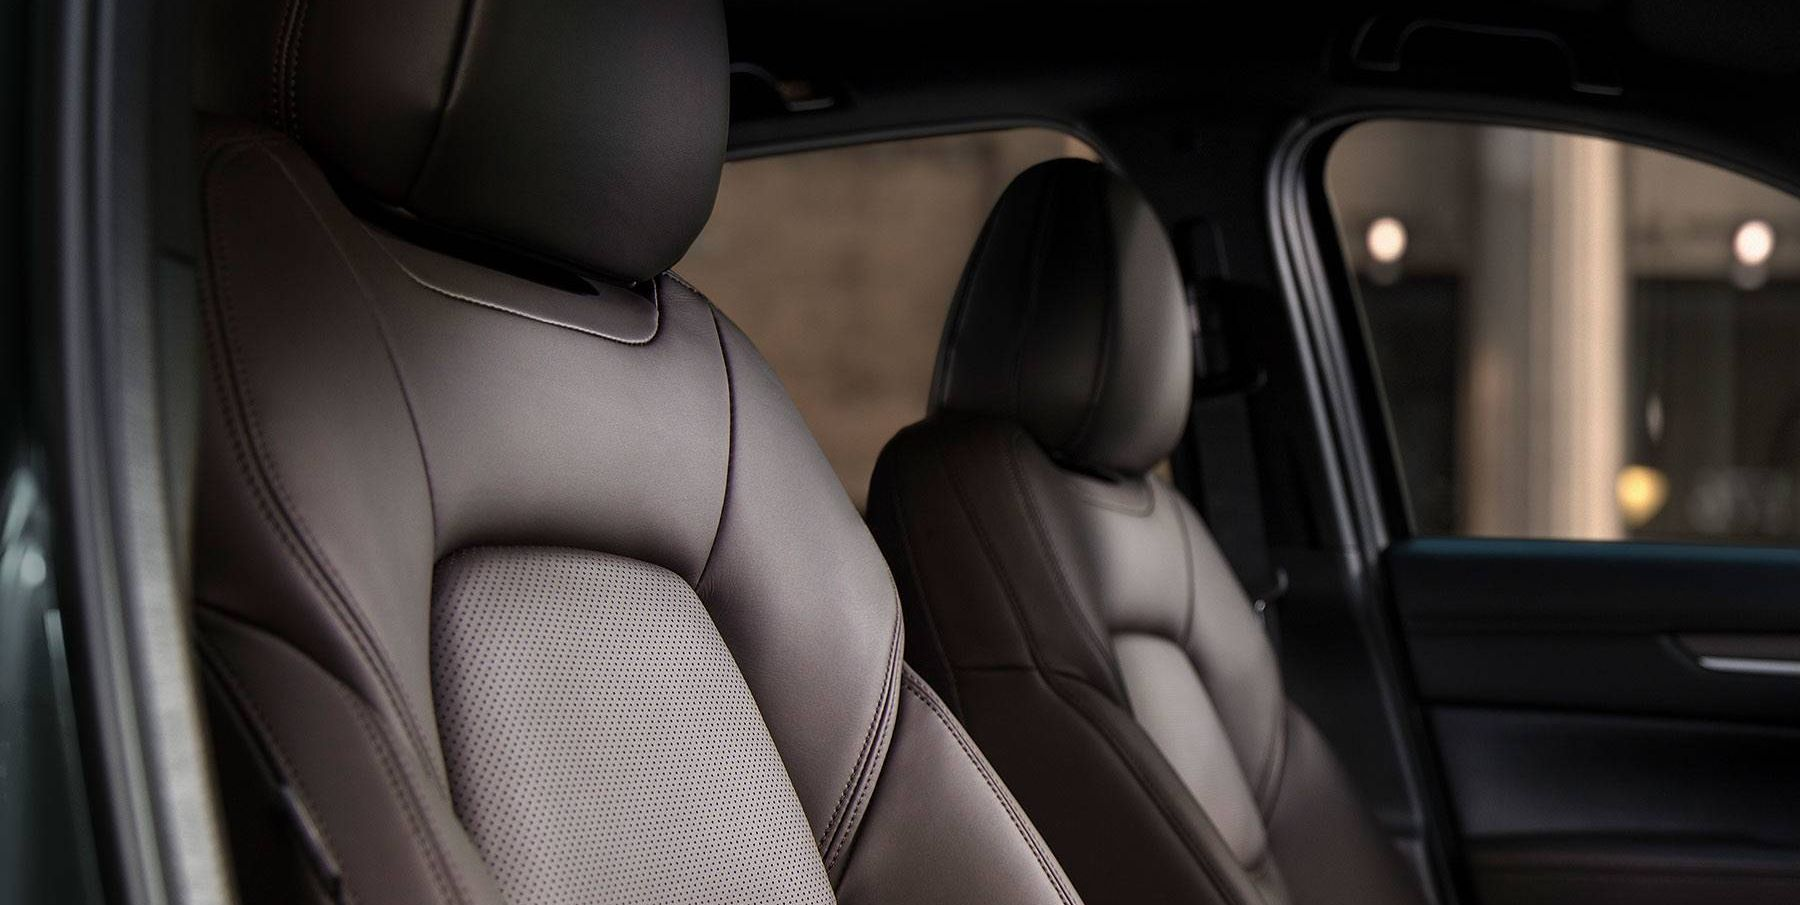 Cozy Seats in the Mazda CX-5